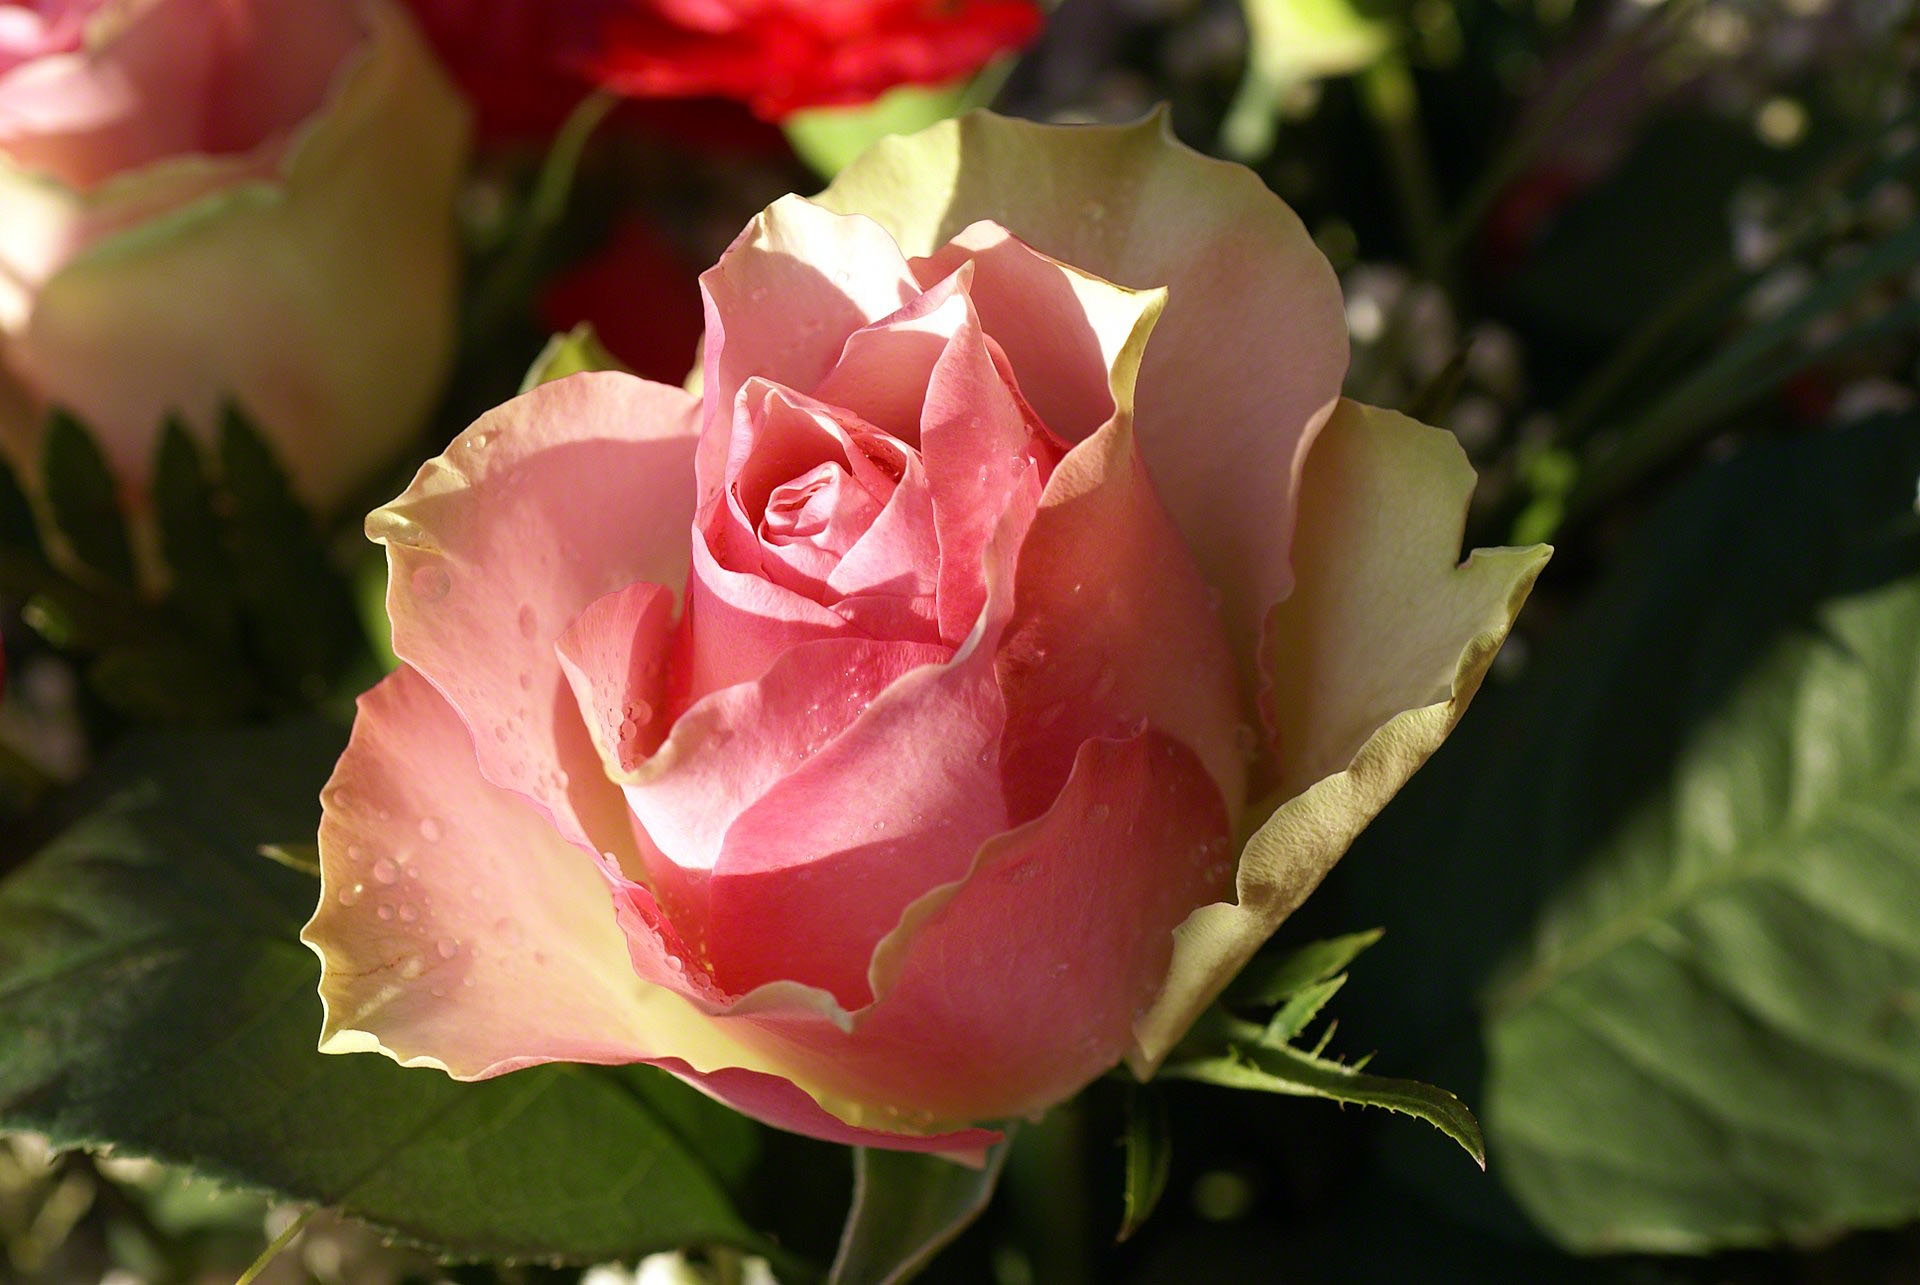 http://www.fabiovisentin.com/photography/photo/12/rose-macro.jpg